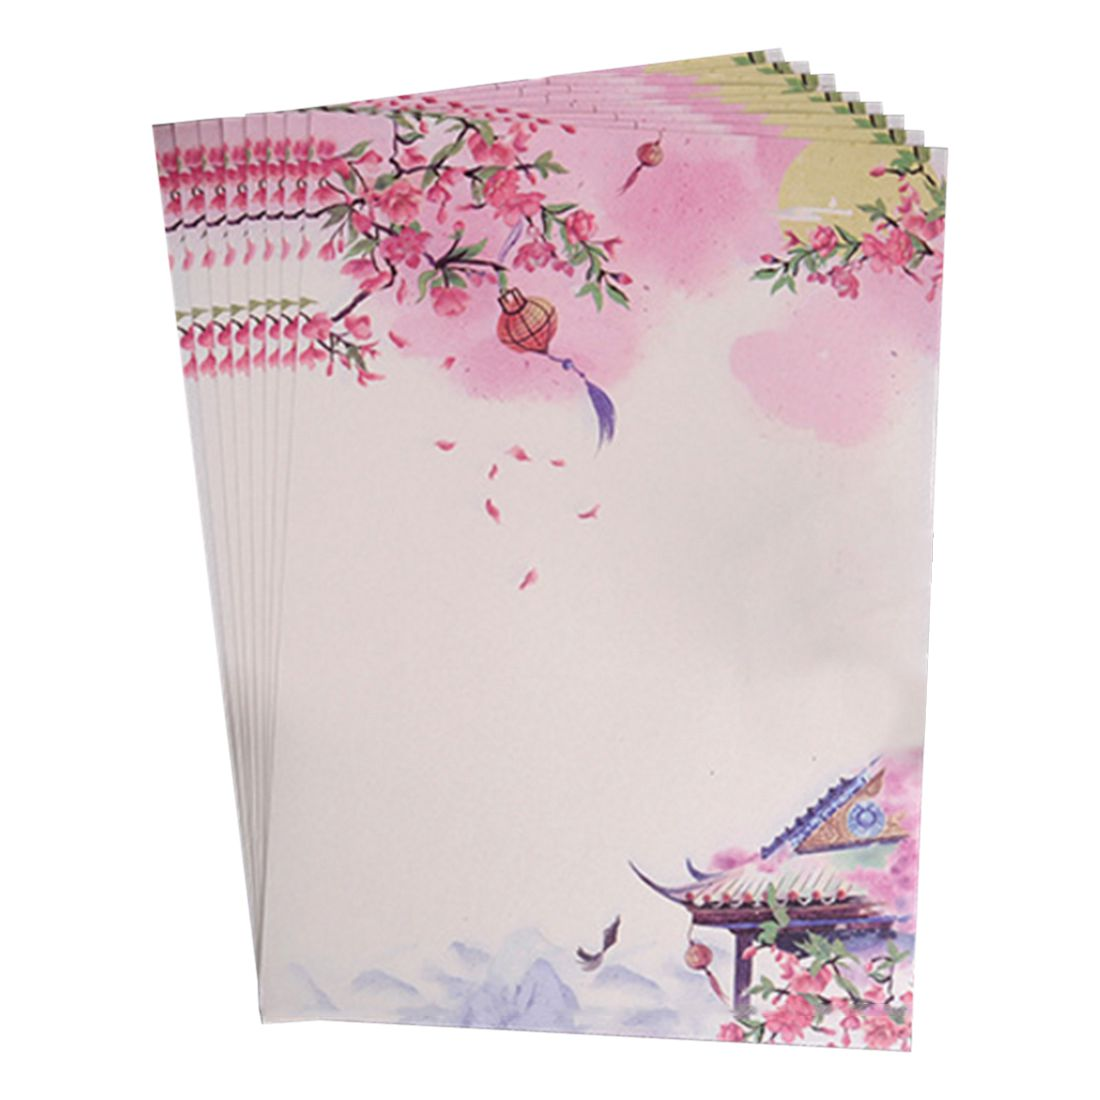 40pcs Romantic love letter, student news envelopes, Chinese wind retro beautiful scenery envelope,pink